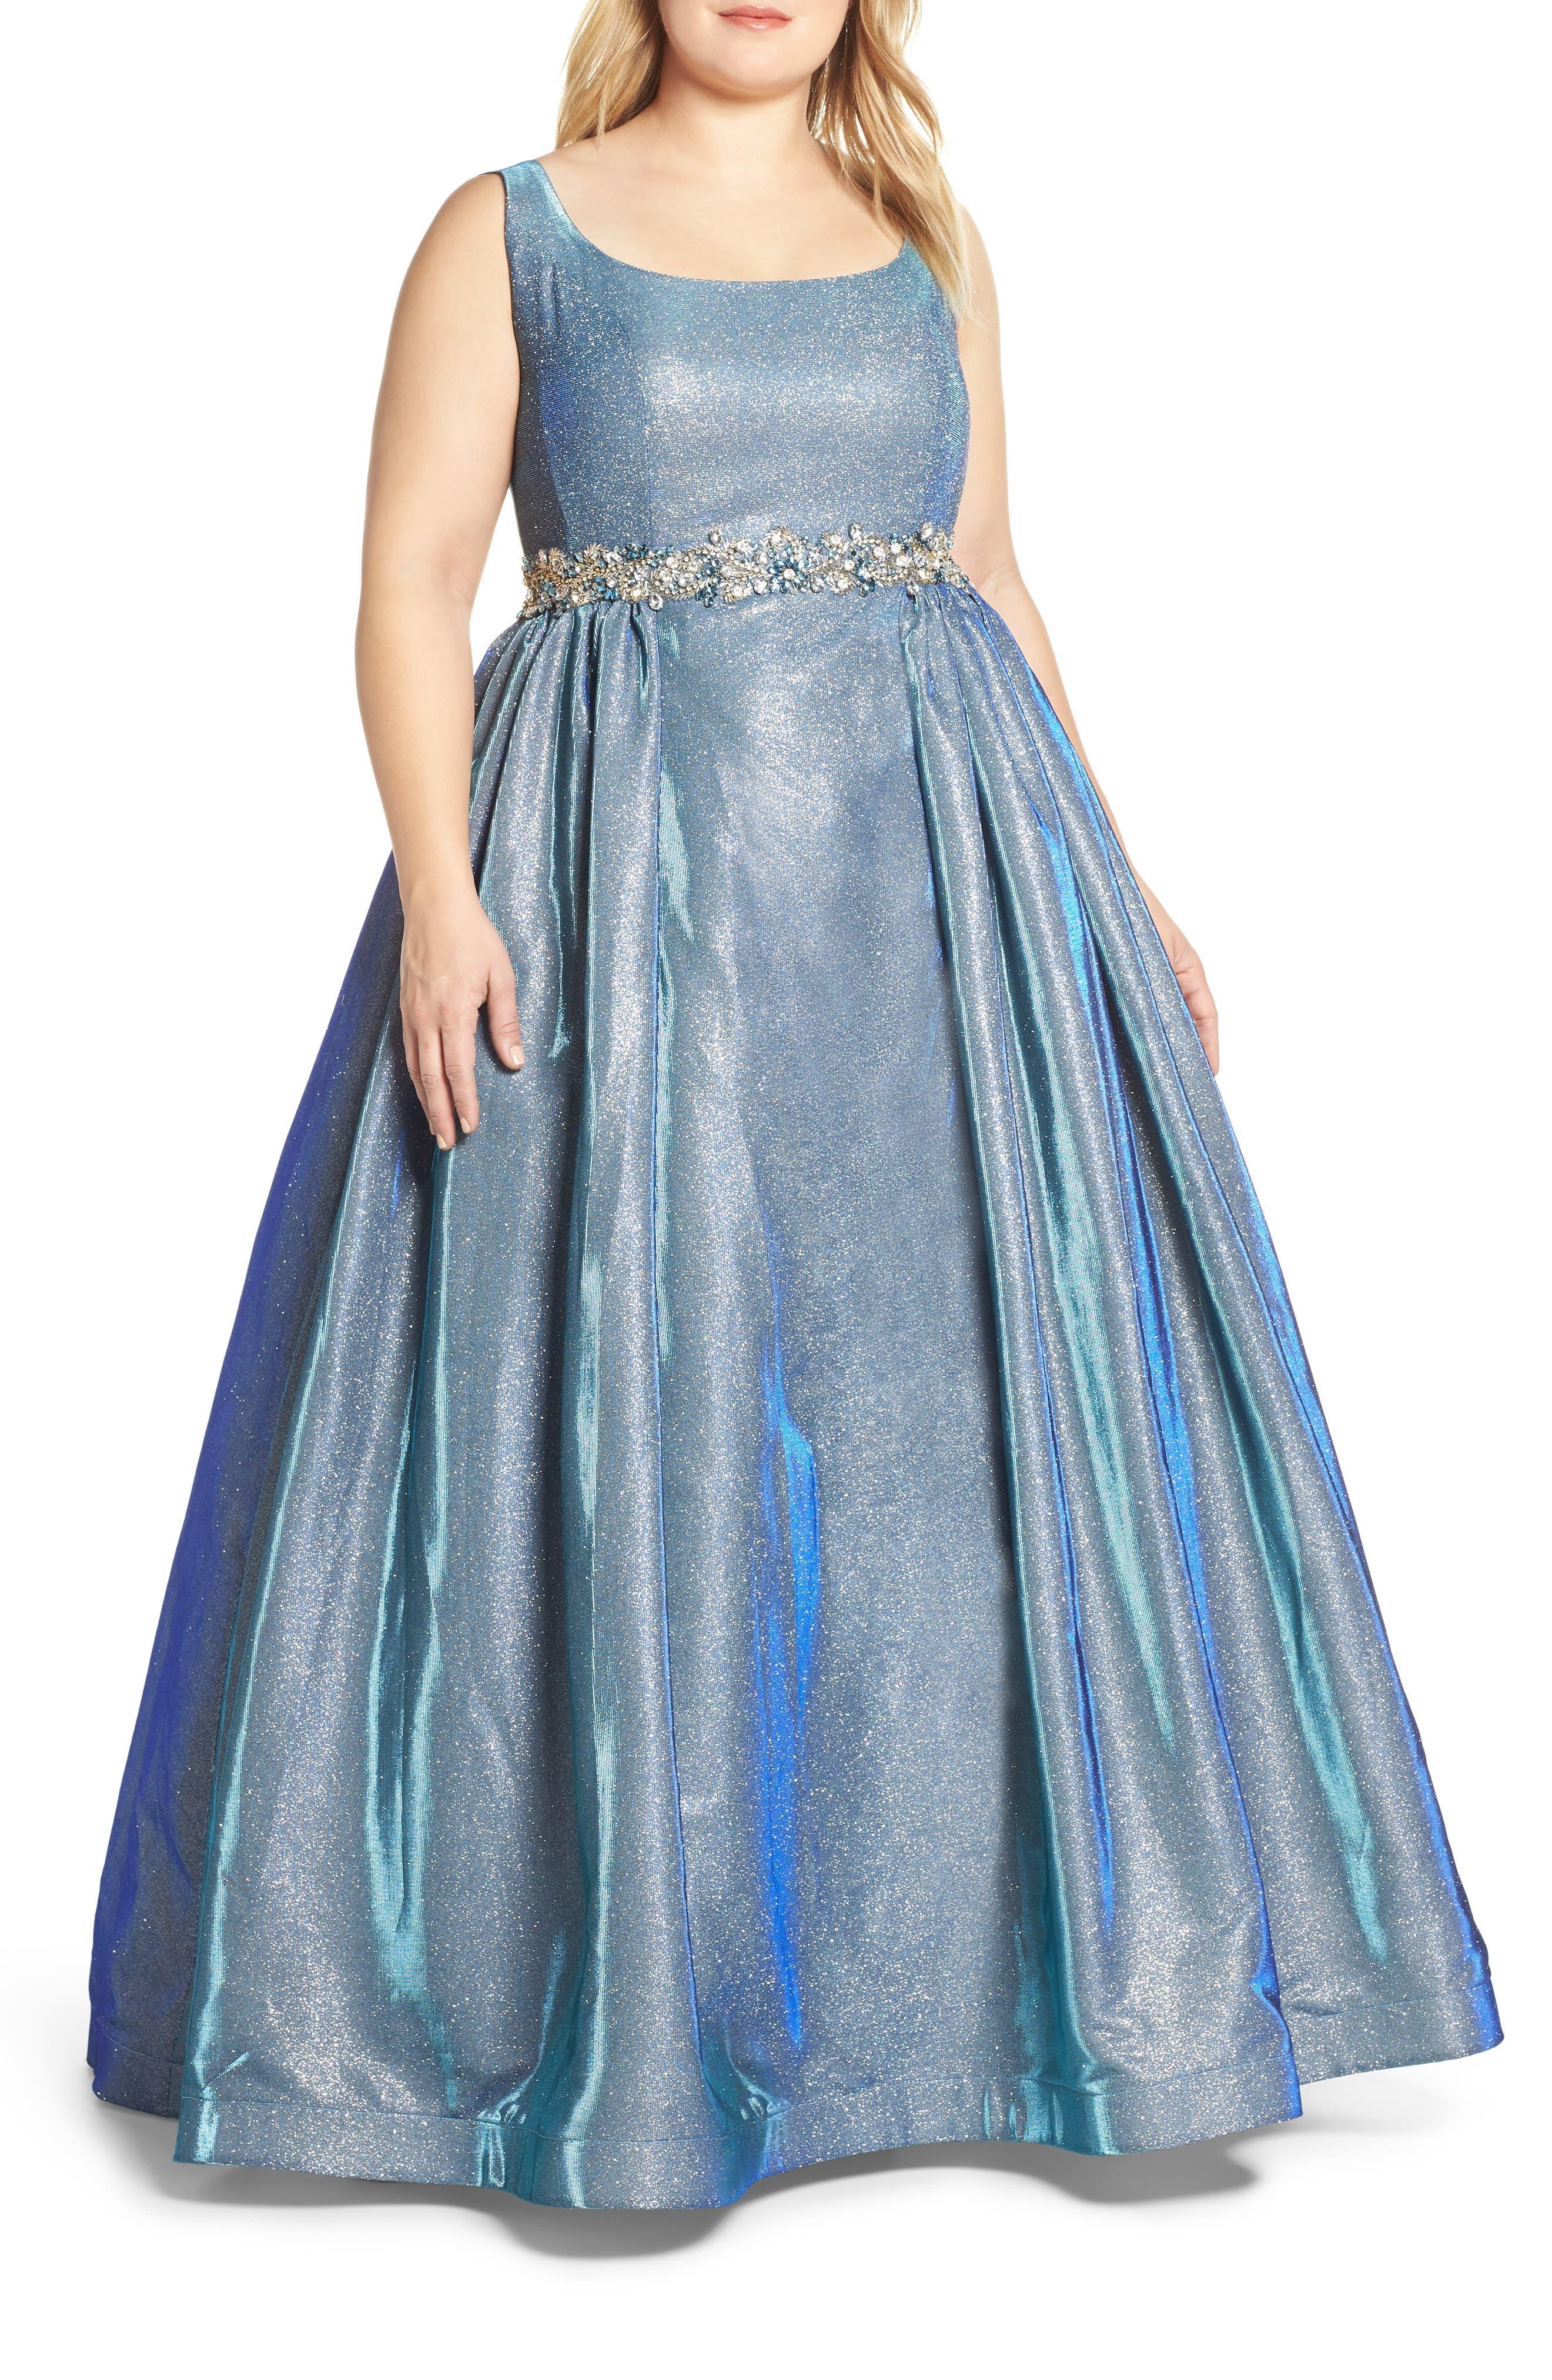 MAC DUGGAL, Jeweled Waist Metallic Evening Dress, Main thumbnail 1, color, BLUE